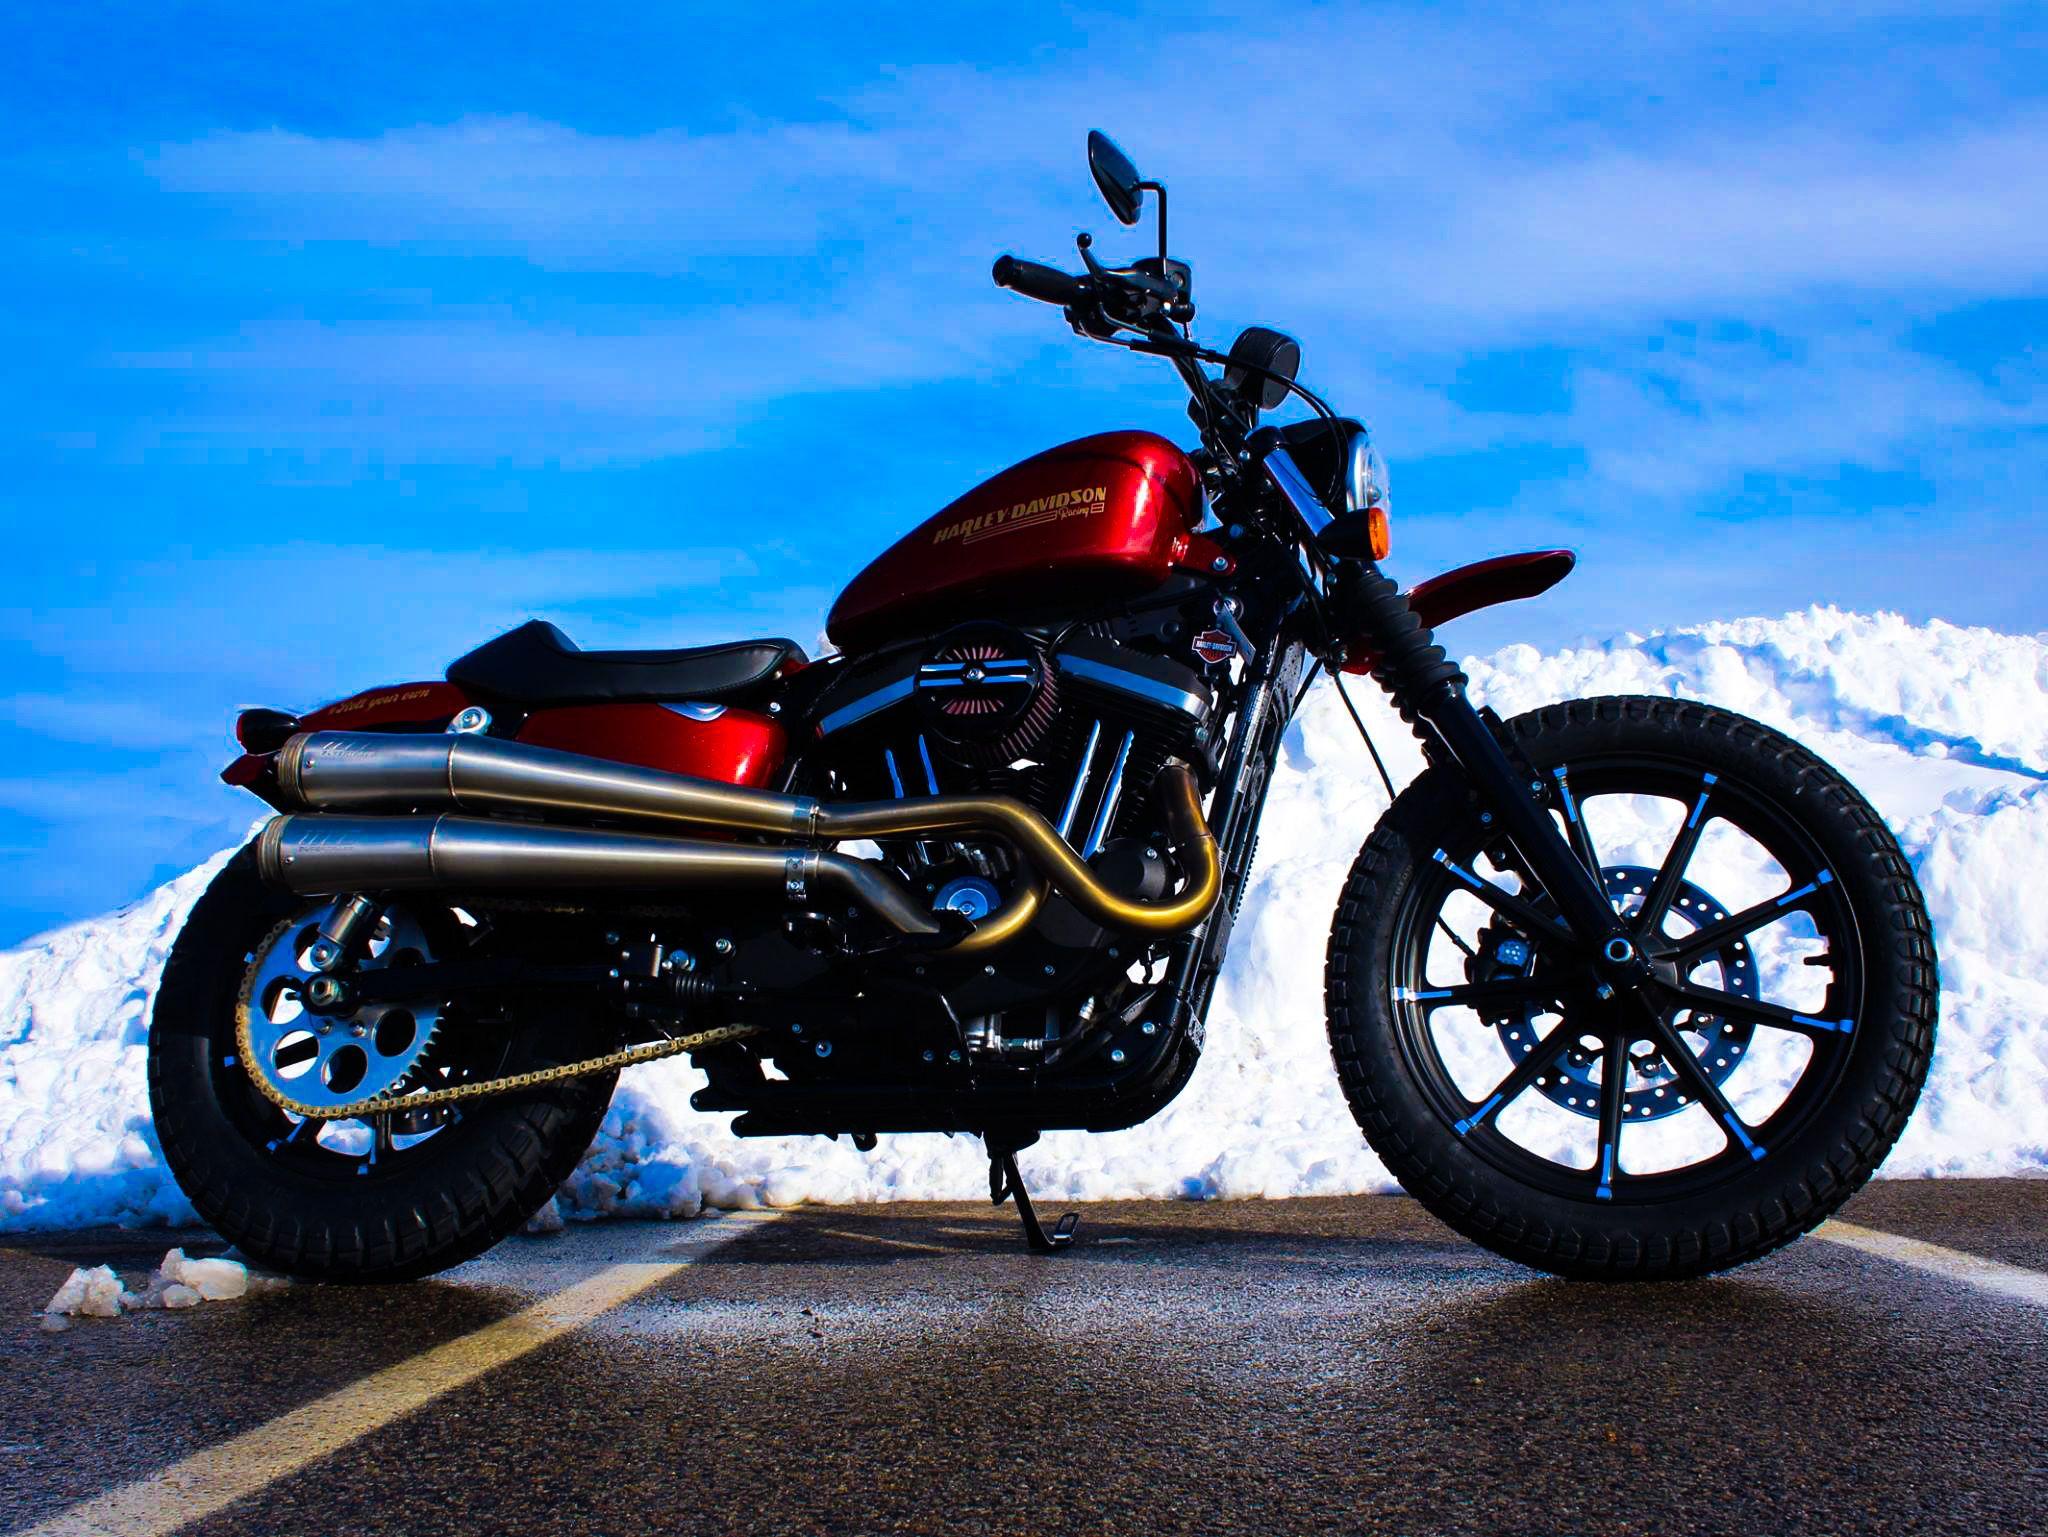 Craigslist Dayton Ohio Motorcycles : Craigslist dayton ...